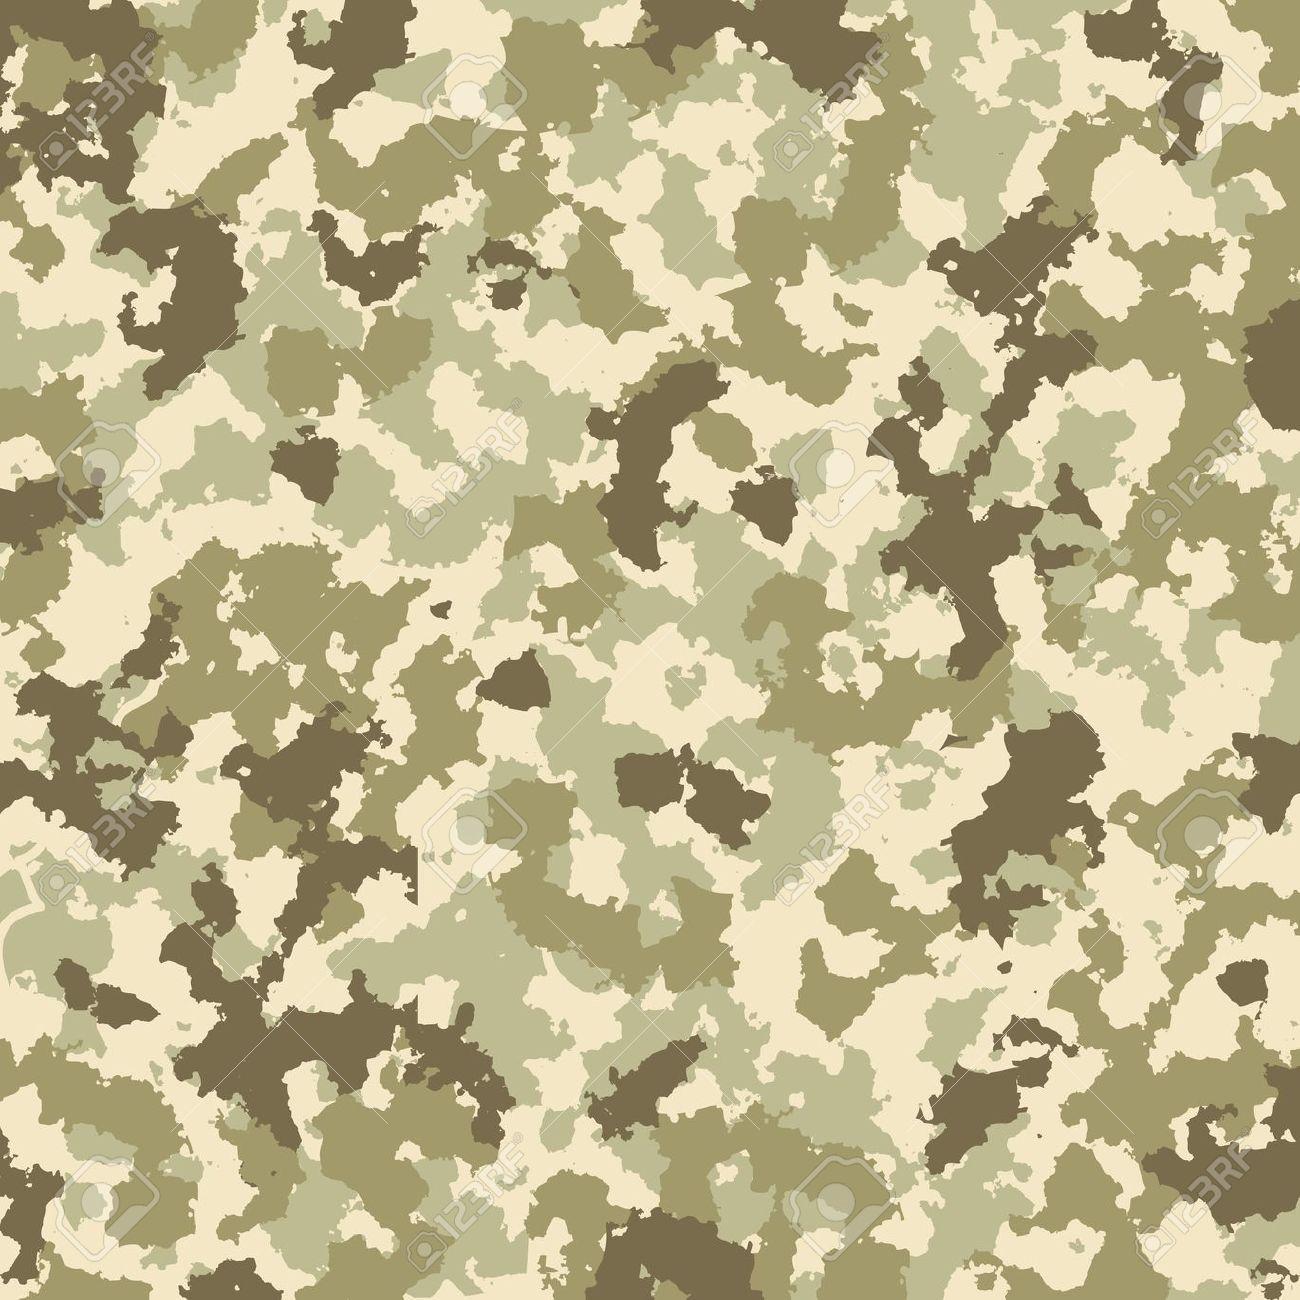 camuflaje militar - Buscar con Google | moto | Pinterest | Camuflaje ...